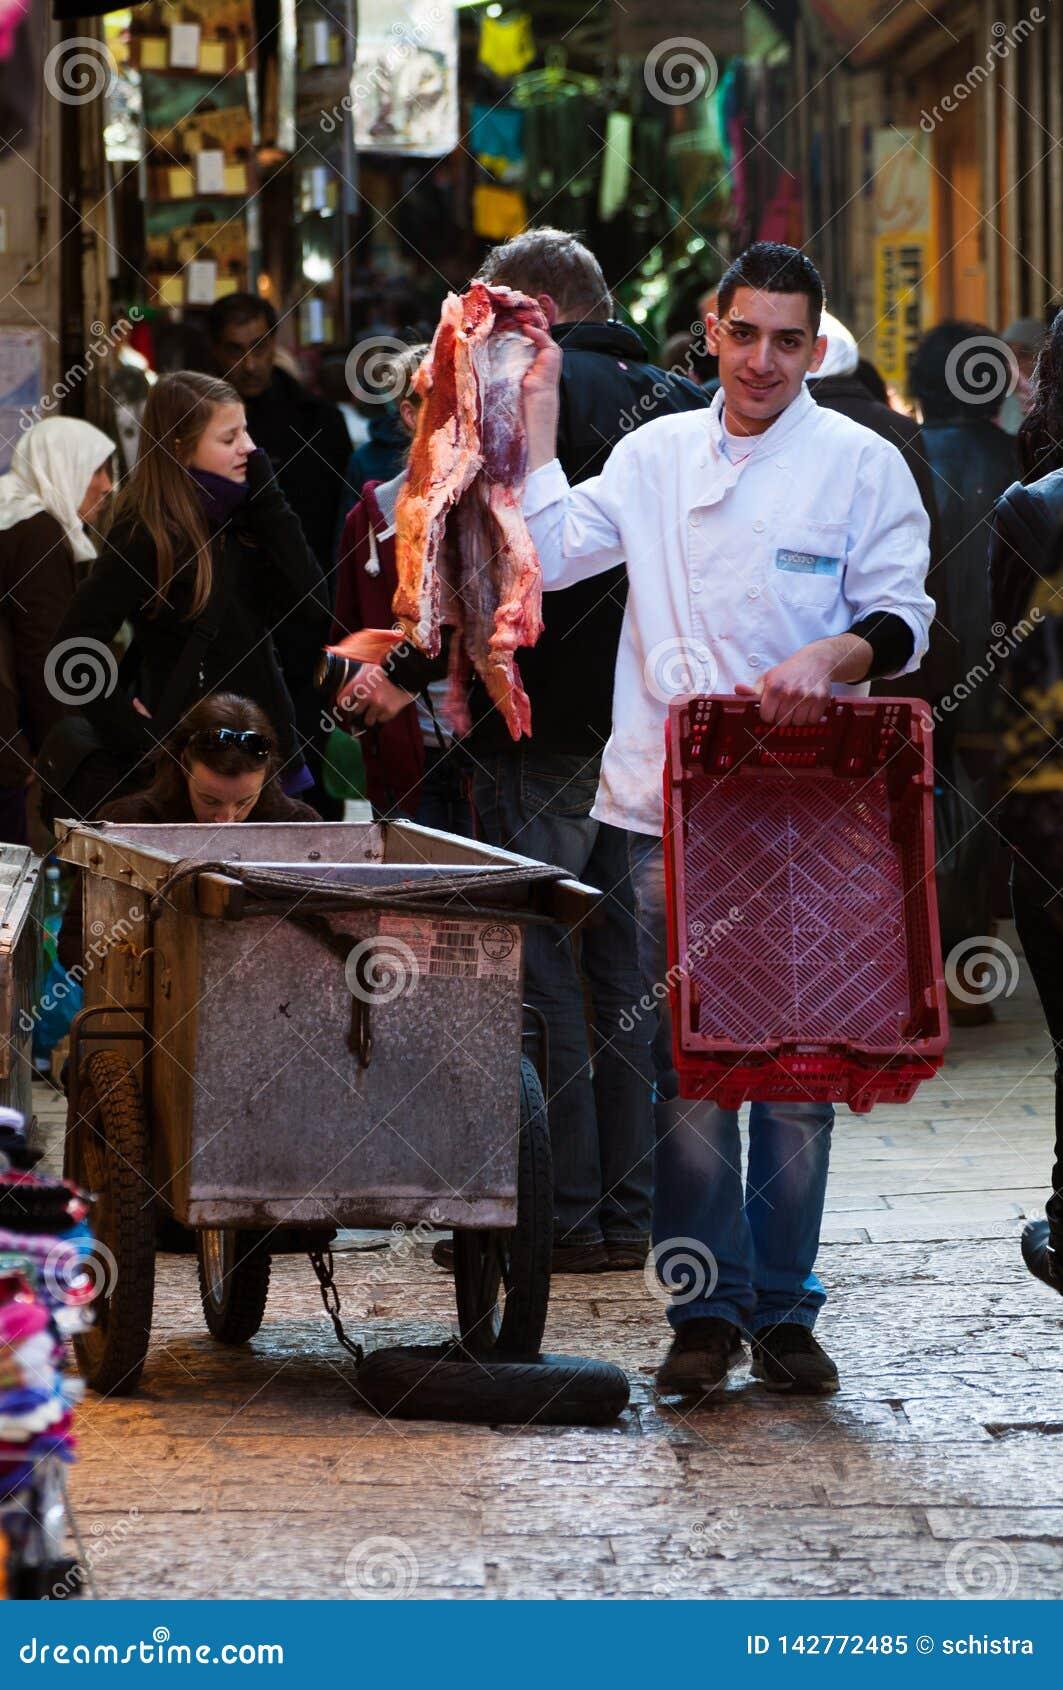 Jerusalén, diciembre de 2012: El carnicero joven negocia la carne en el souk de Jerusalén